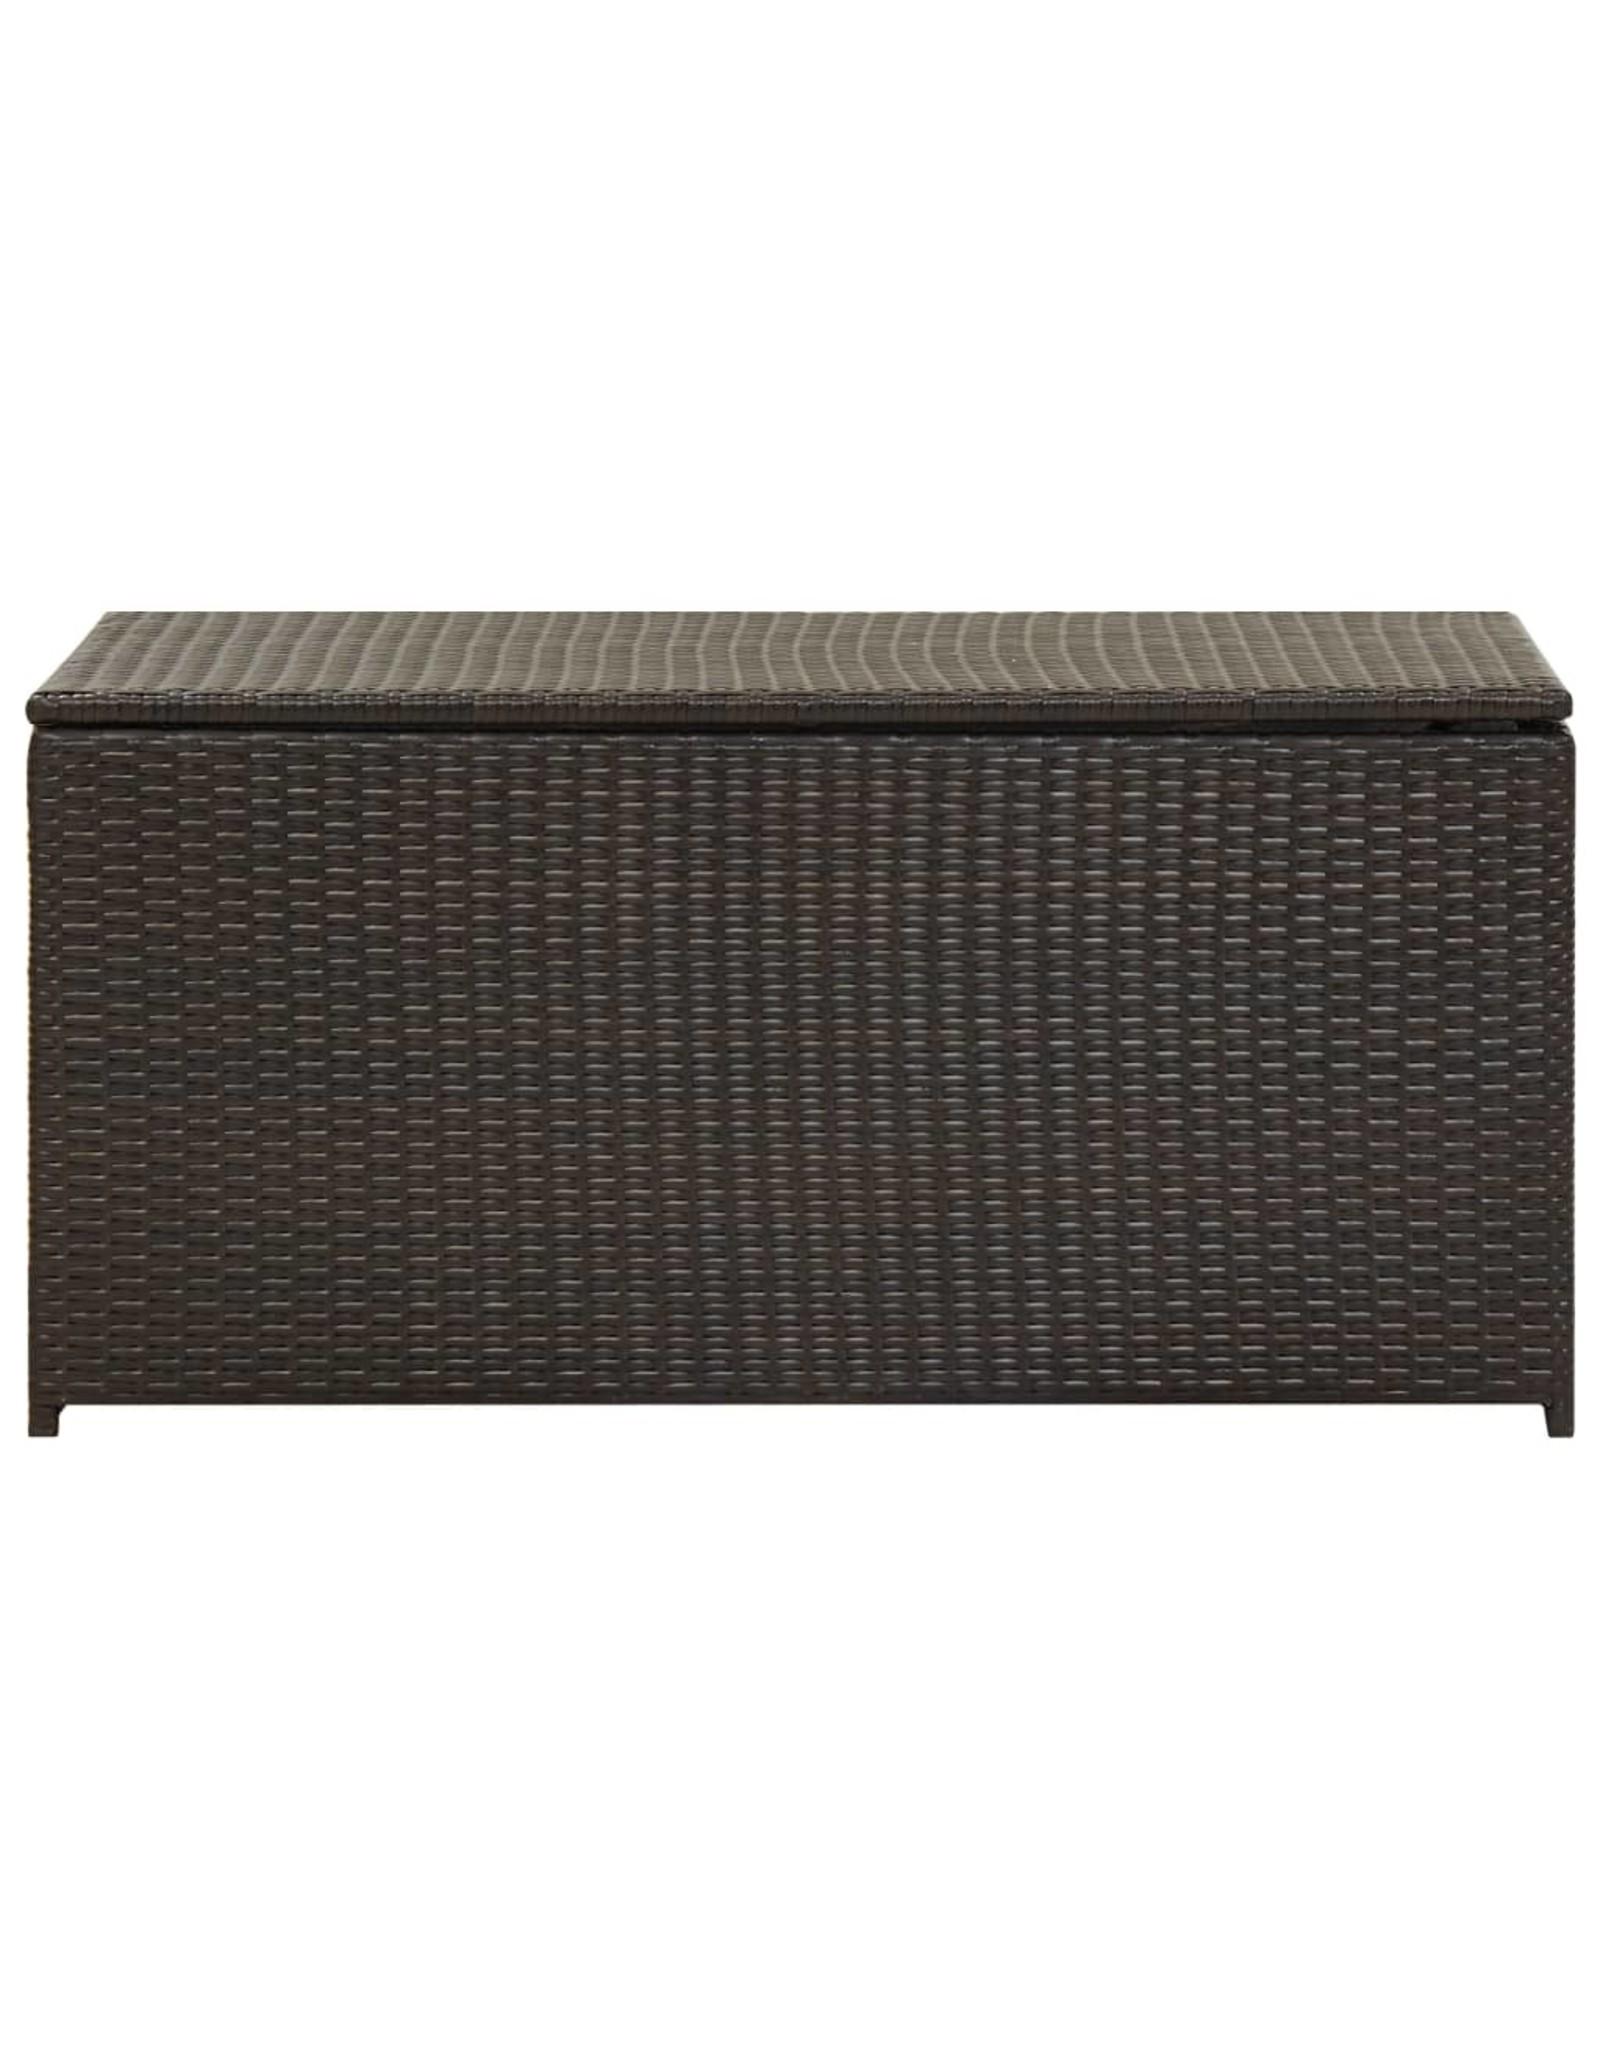 Tuinbox 100x50x50 cm poly rattan bruin